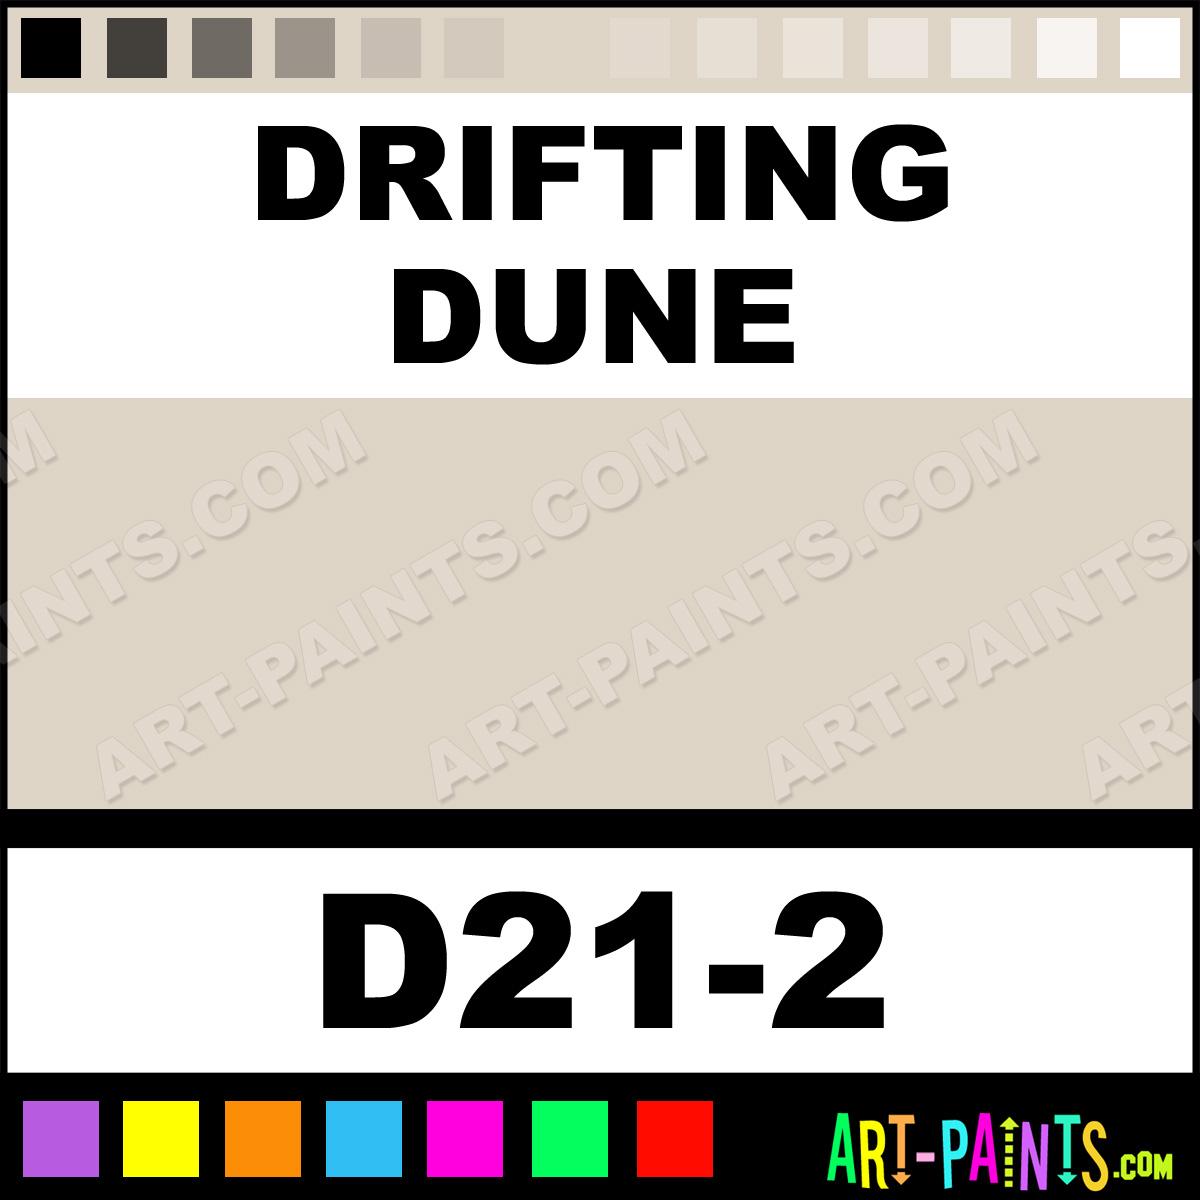 Drifting Dune Interior Exterior Enamel Paints D21 2